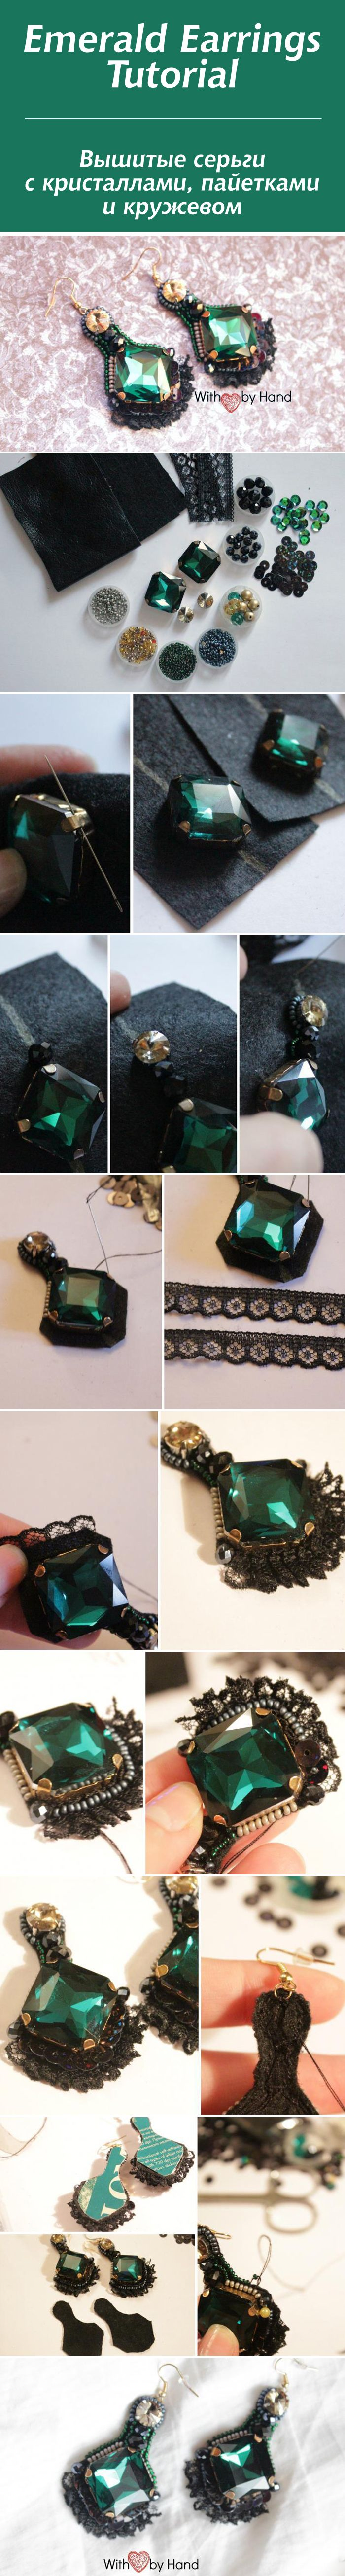 Bead embroidery: Emerald earrings tutorial (Вышитые серьги с кристаллами, пайетками и кружевом)